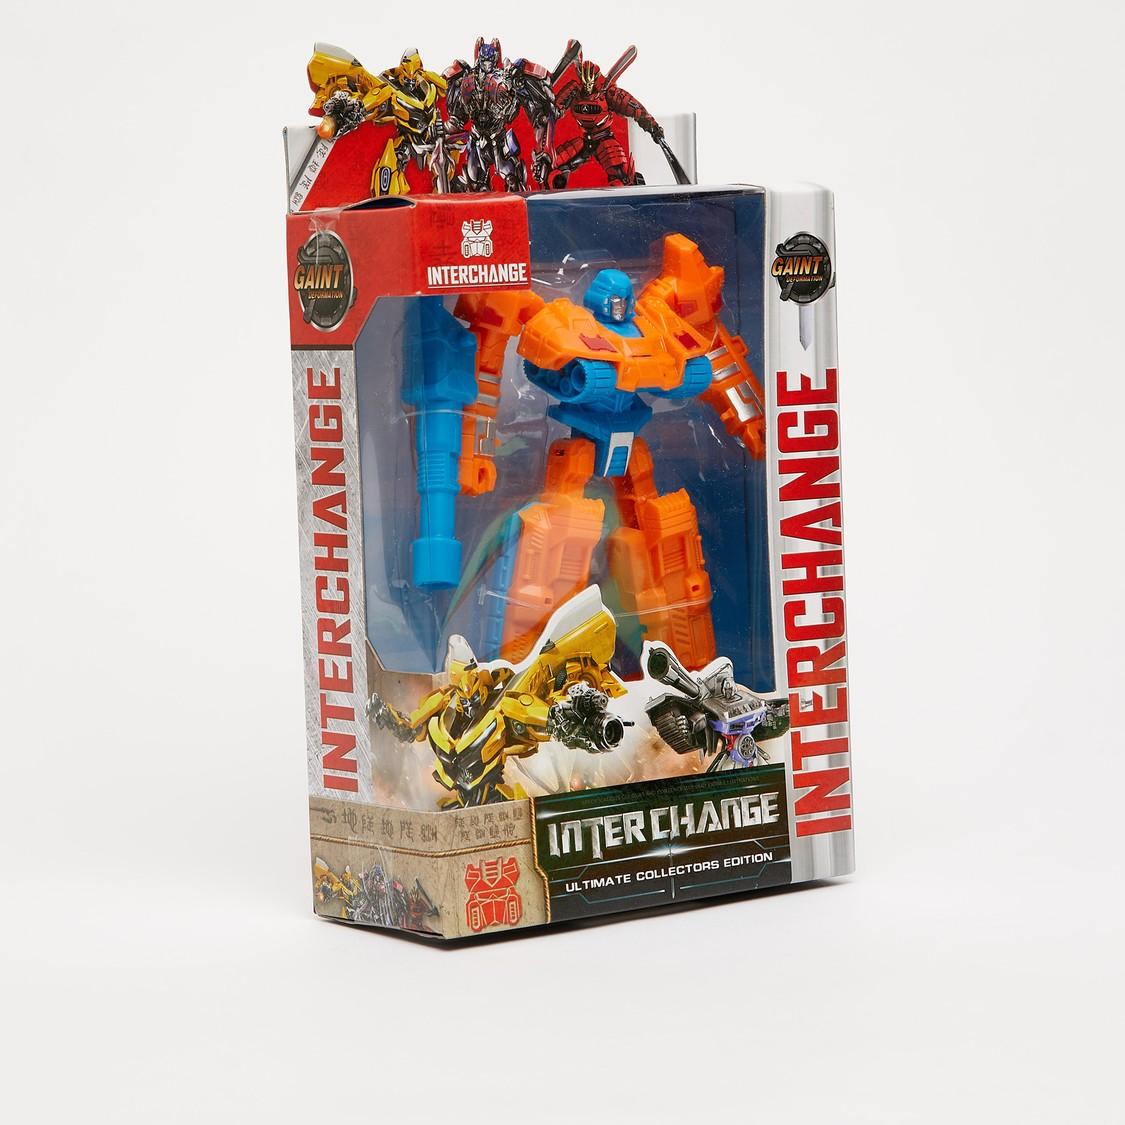 Interchange Action Figurine